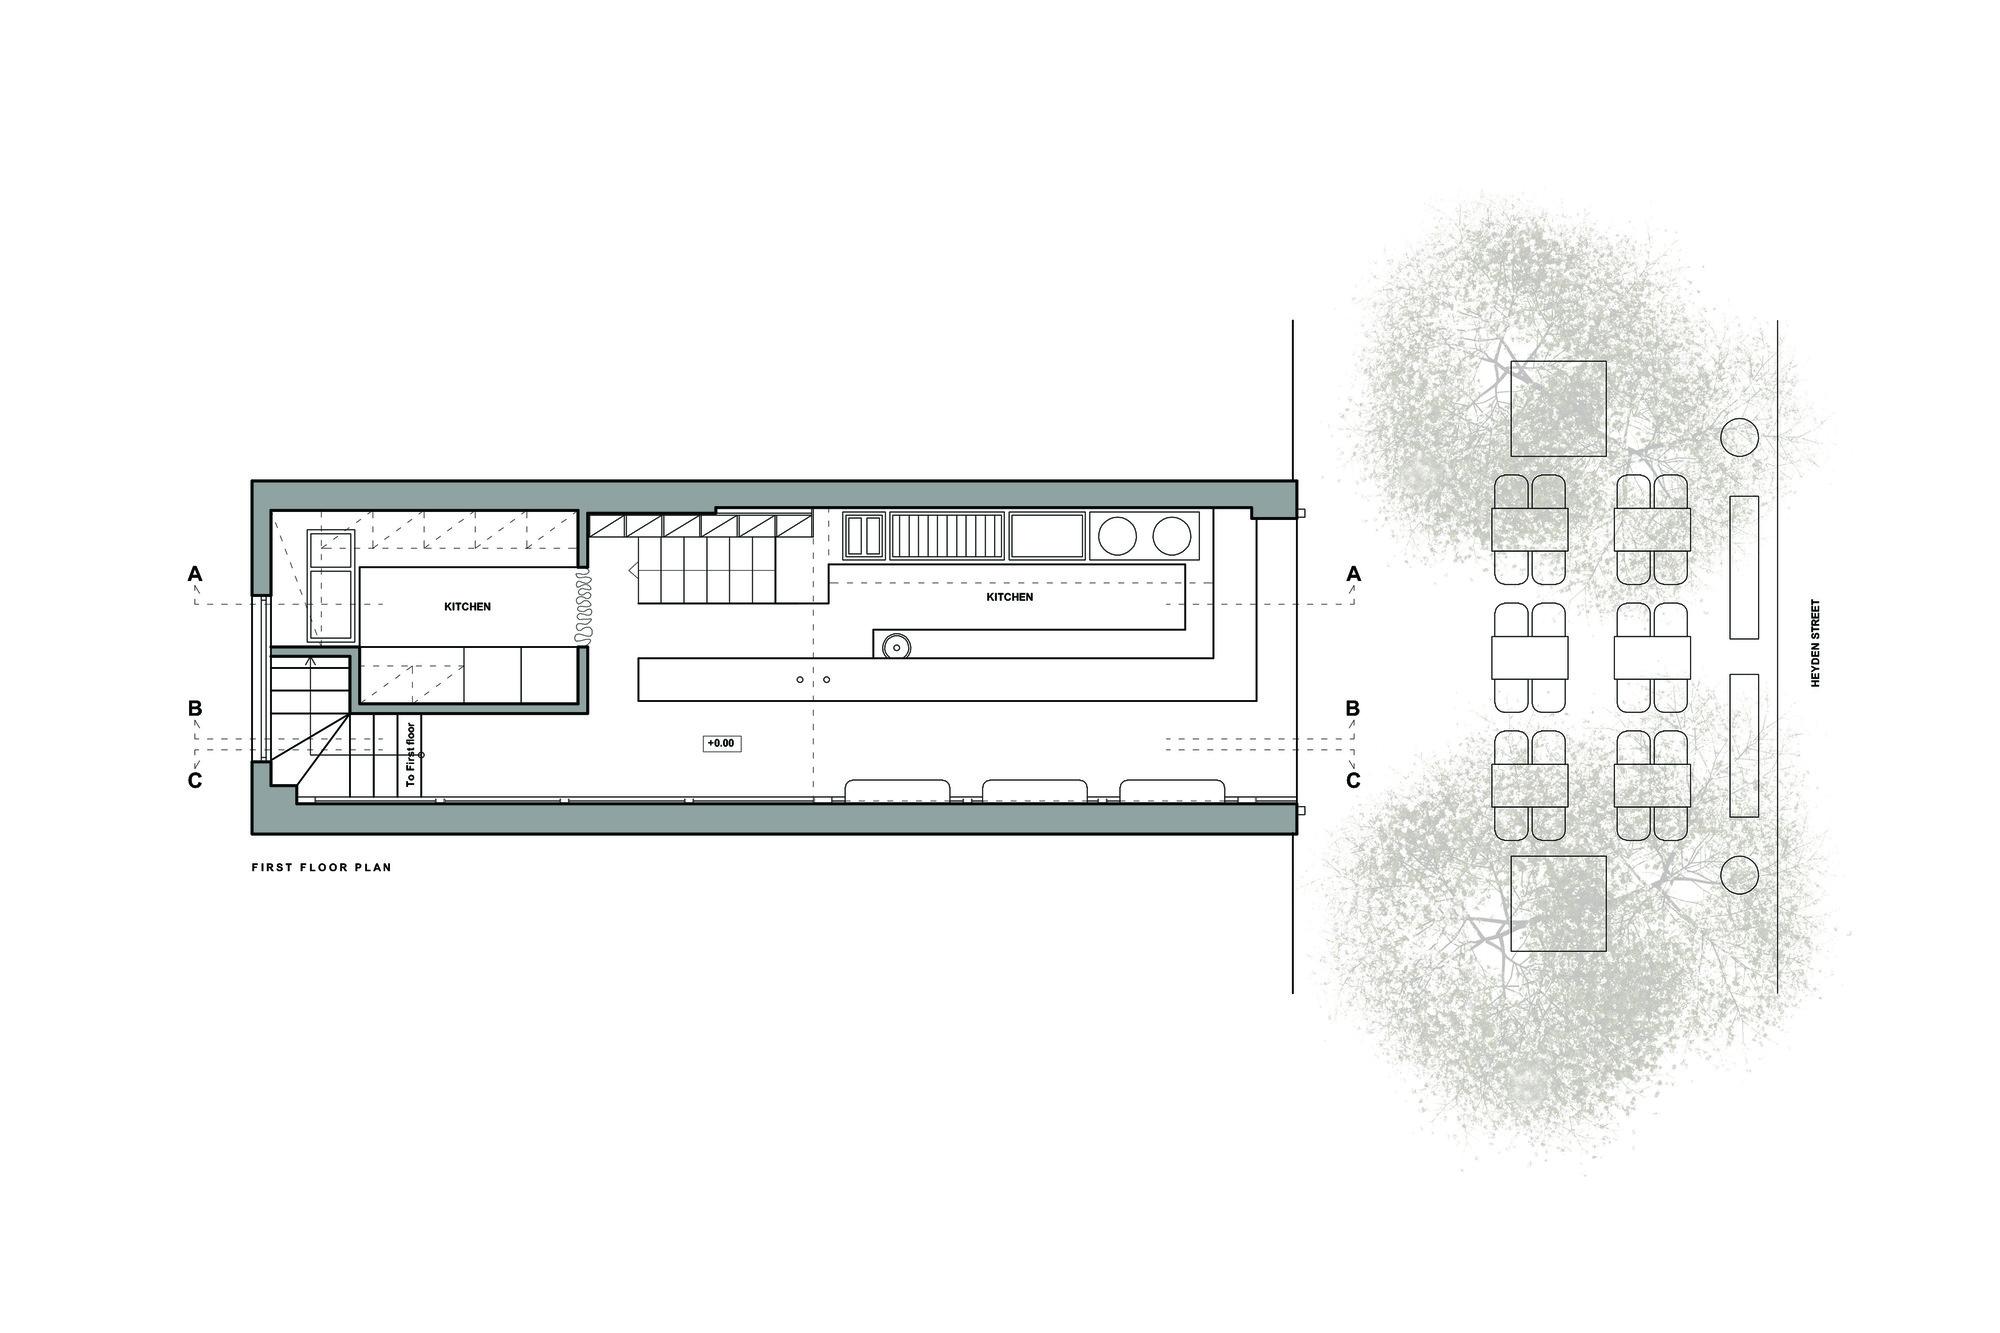 Triopton_Architects_Pitulka_Eatery_Ground_Floor_Plan